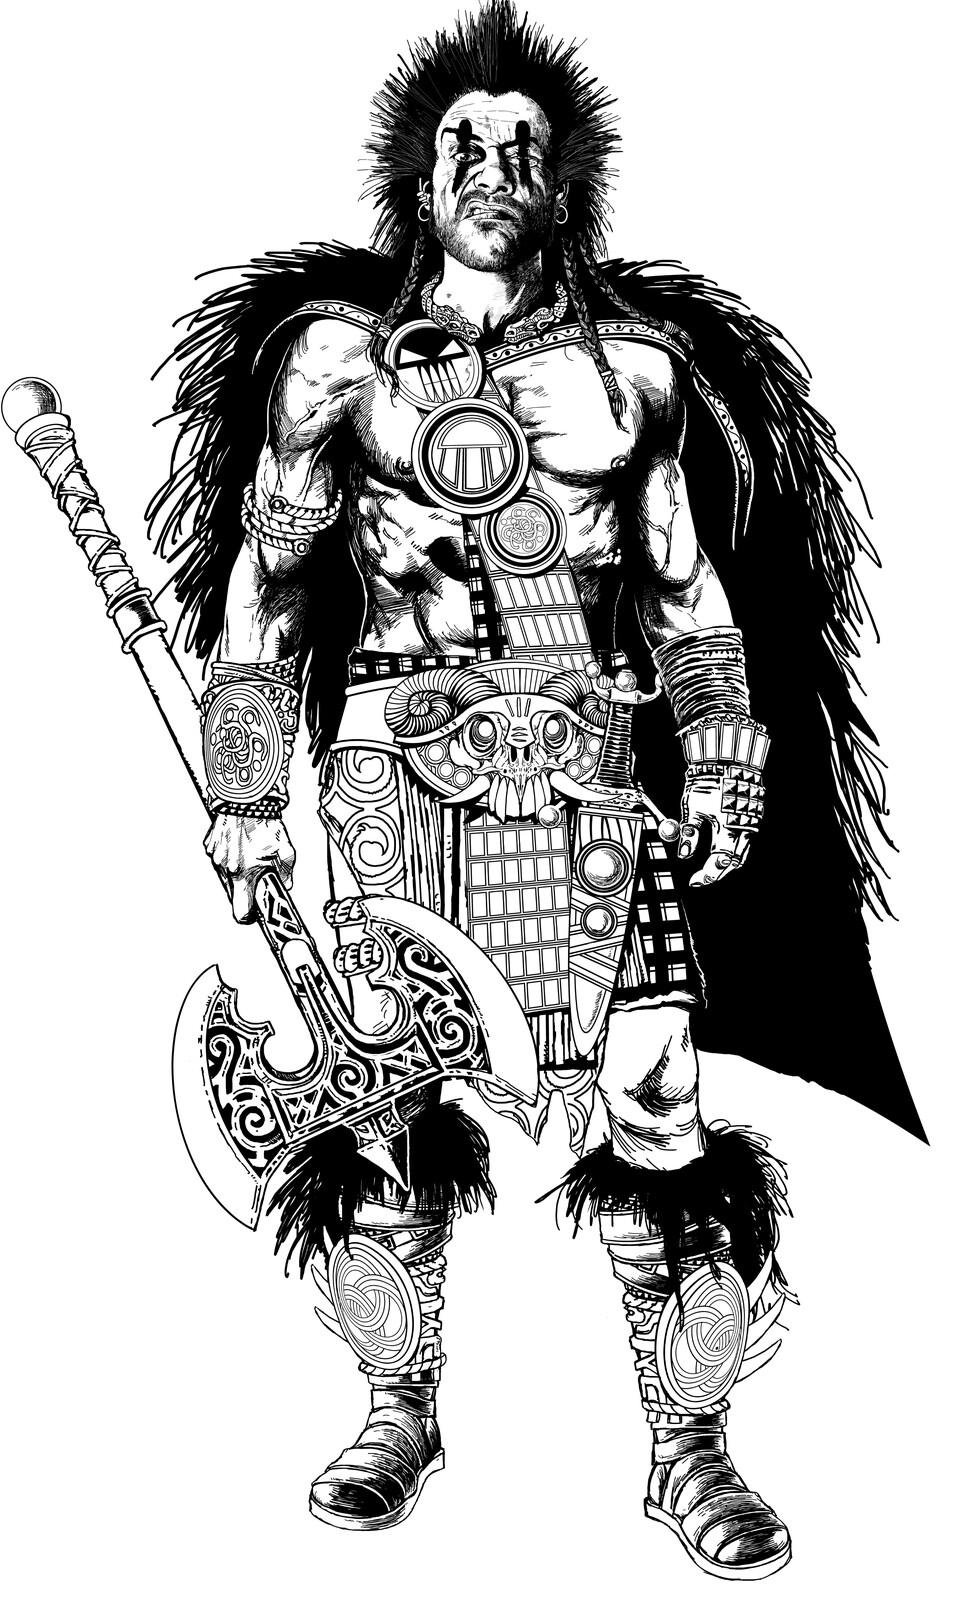 Slaine Character sketch